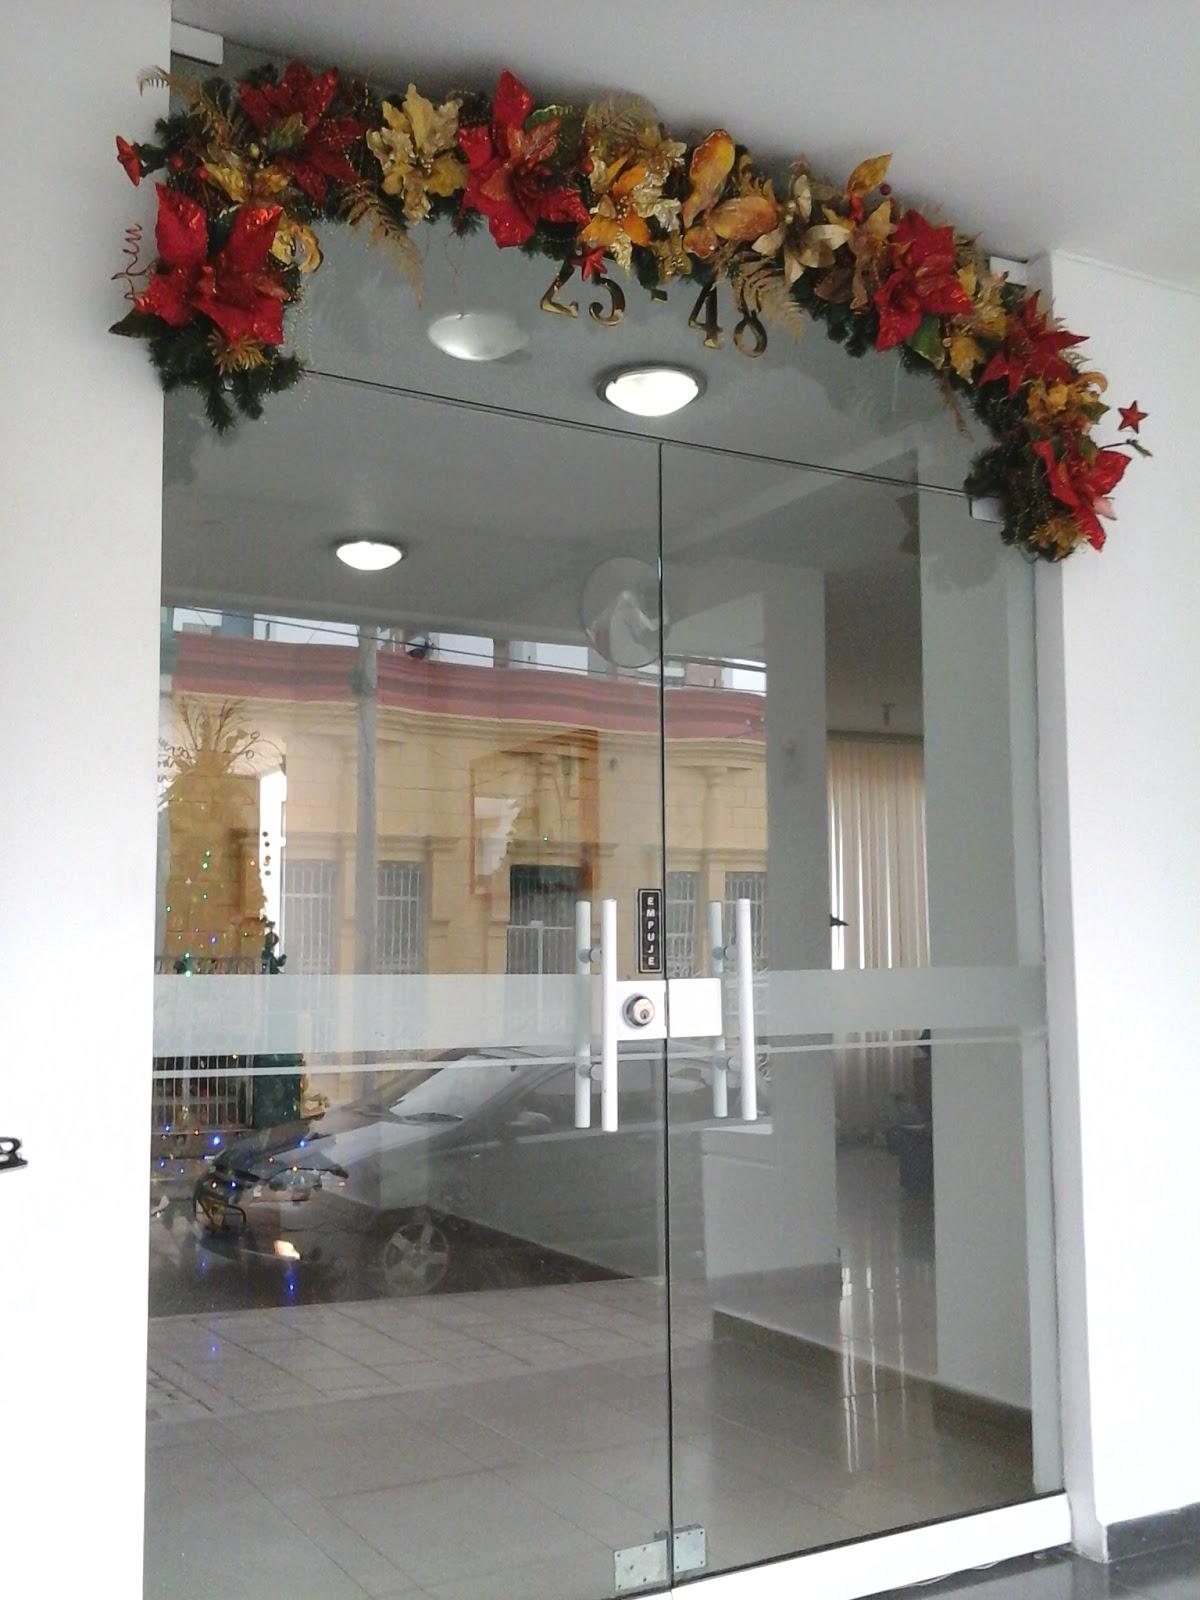 Guirnaldas para fachadas decoraciones navide as for Guirnaldas para puertas navidenas